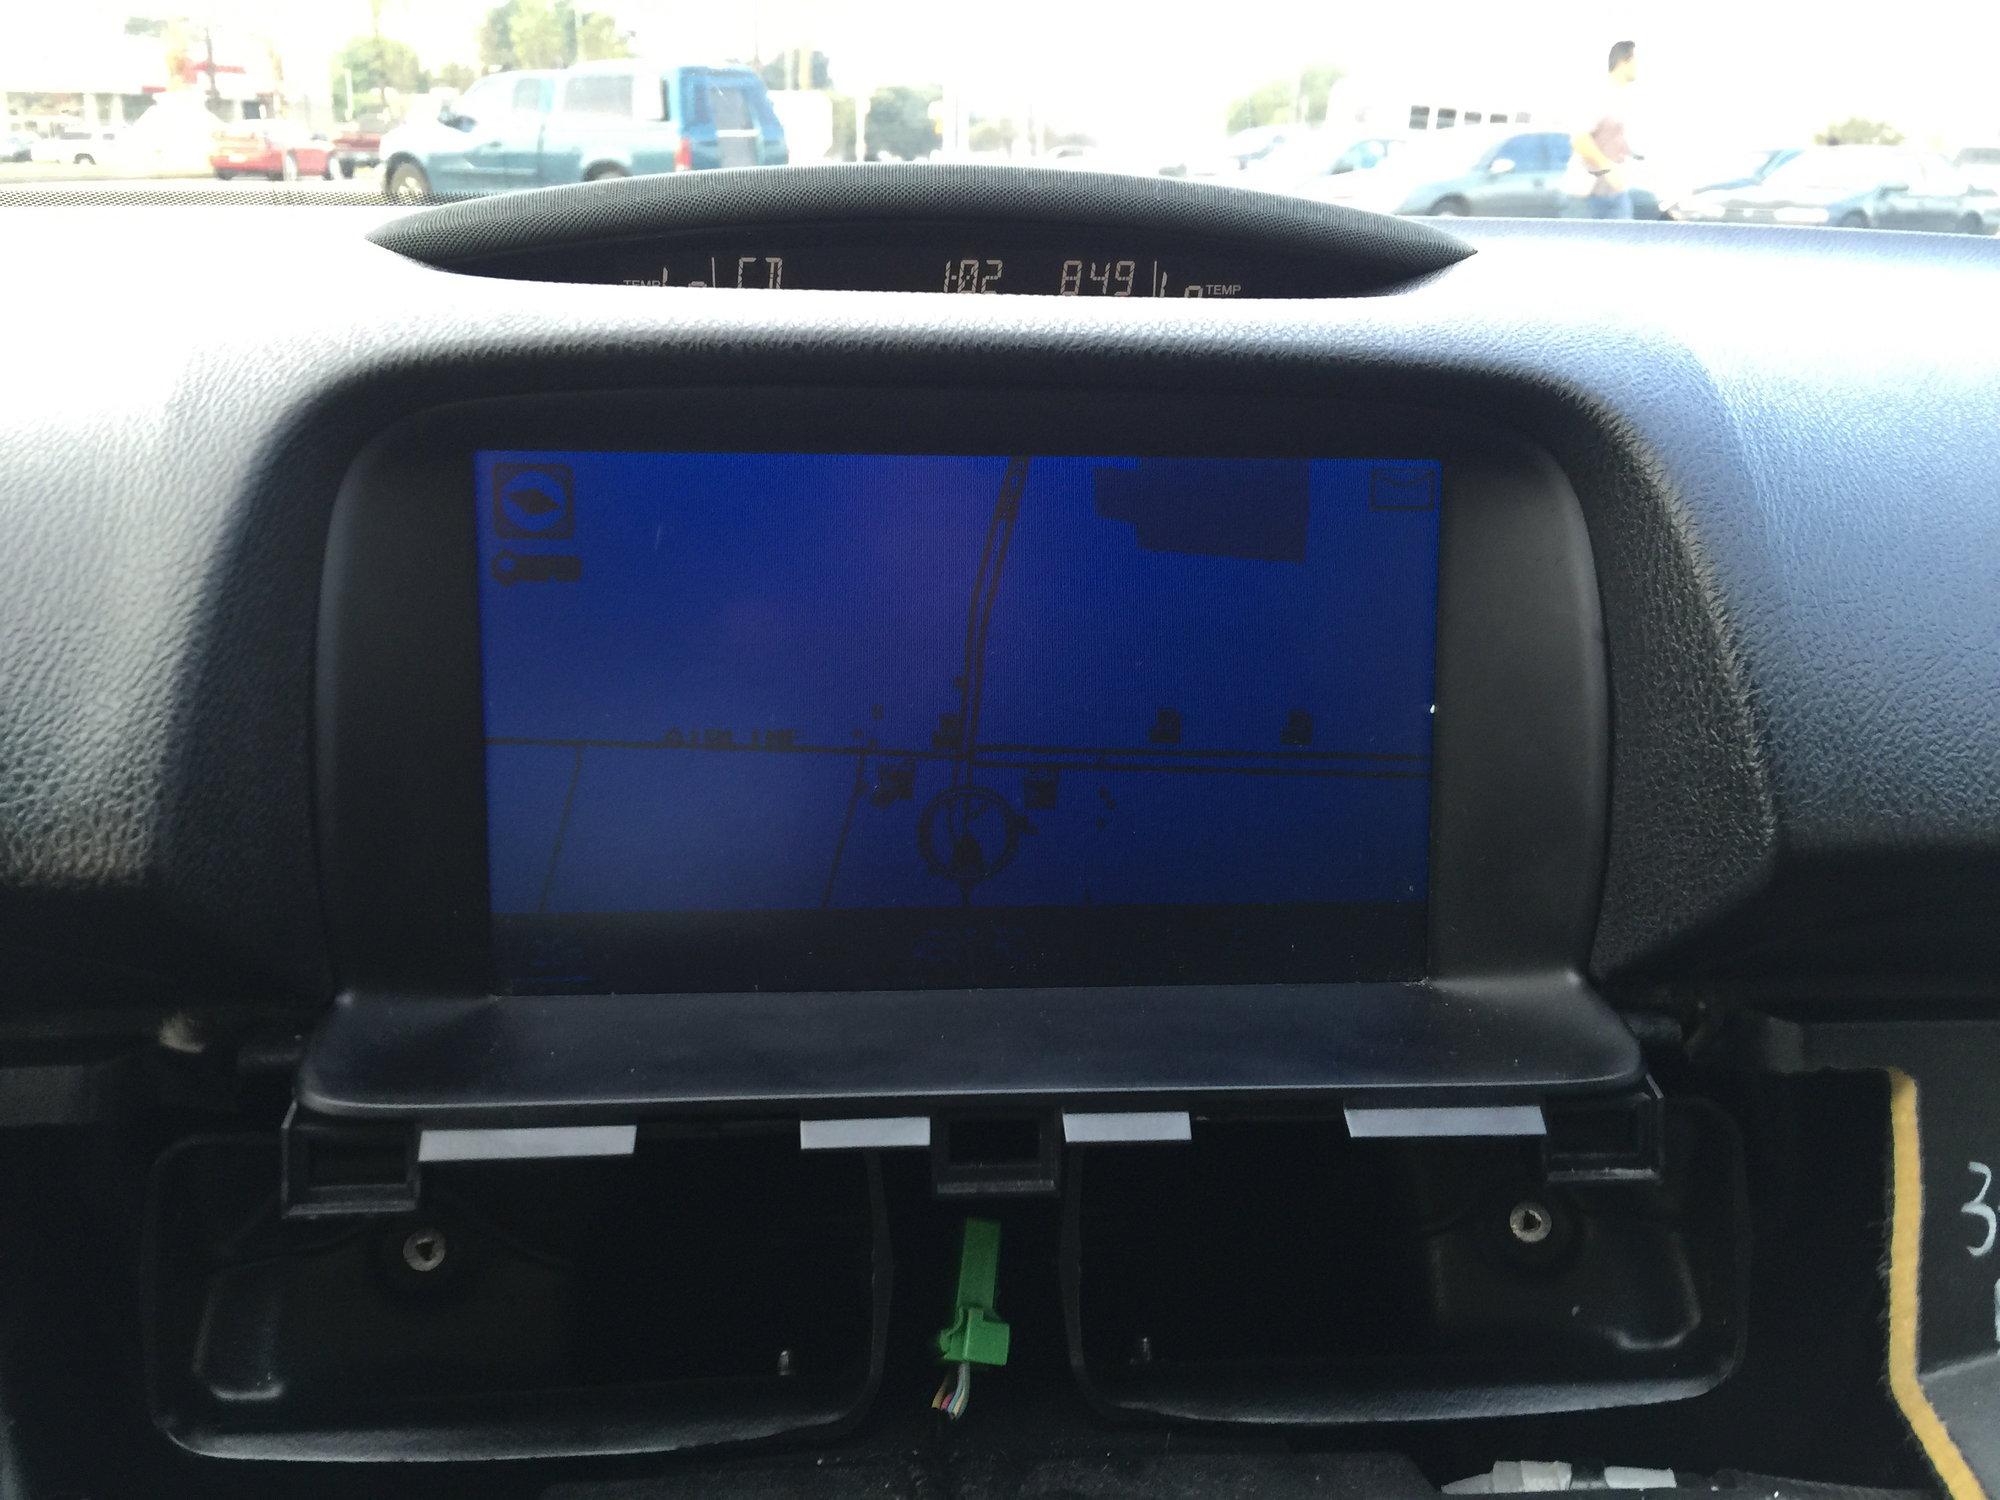 2005 acura tl navigation screen black